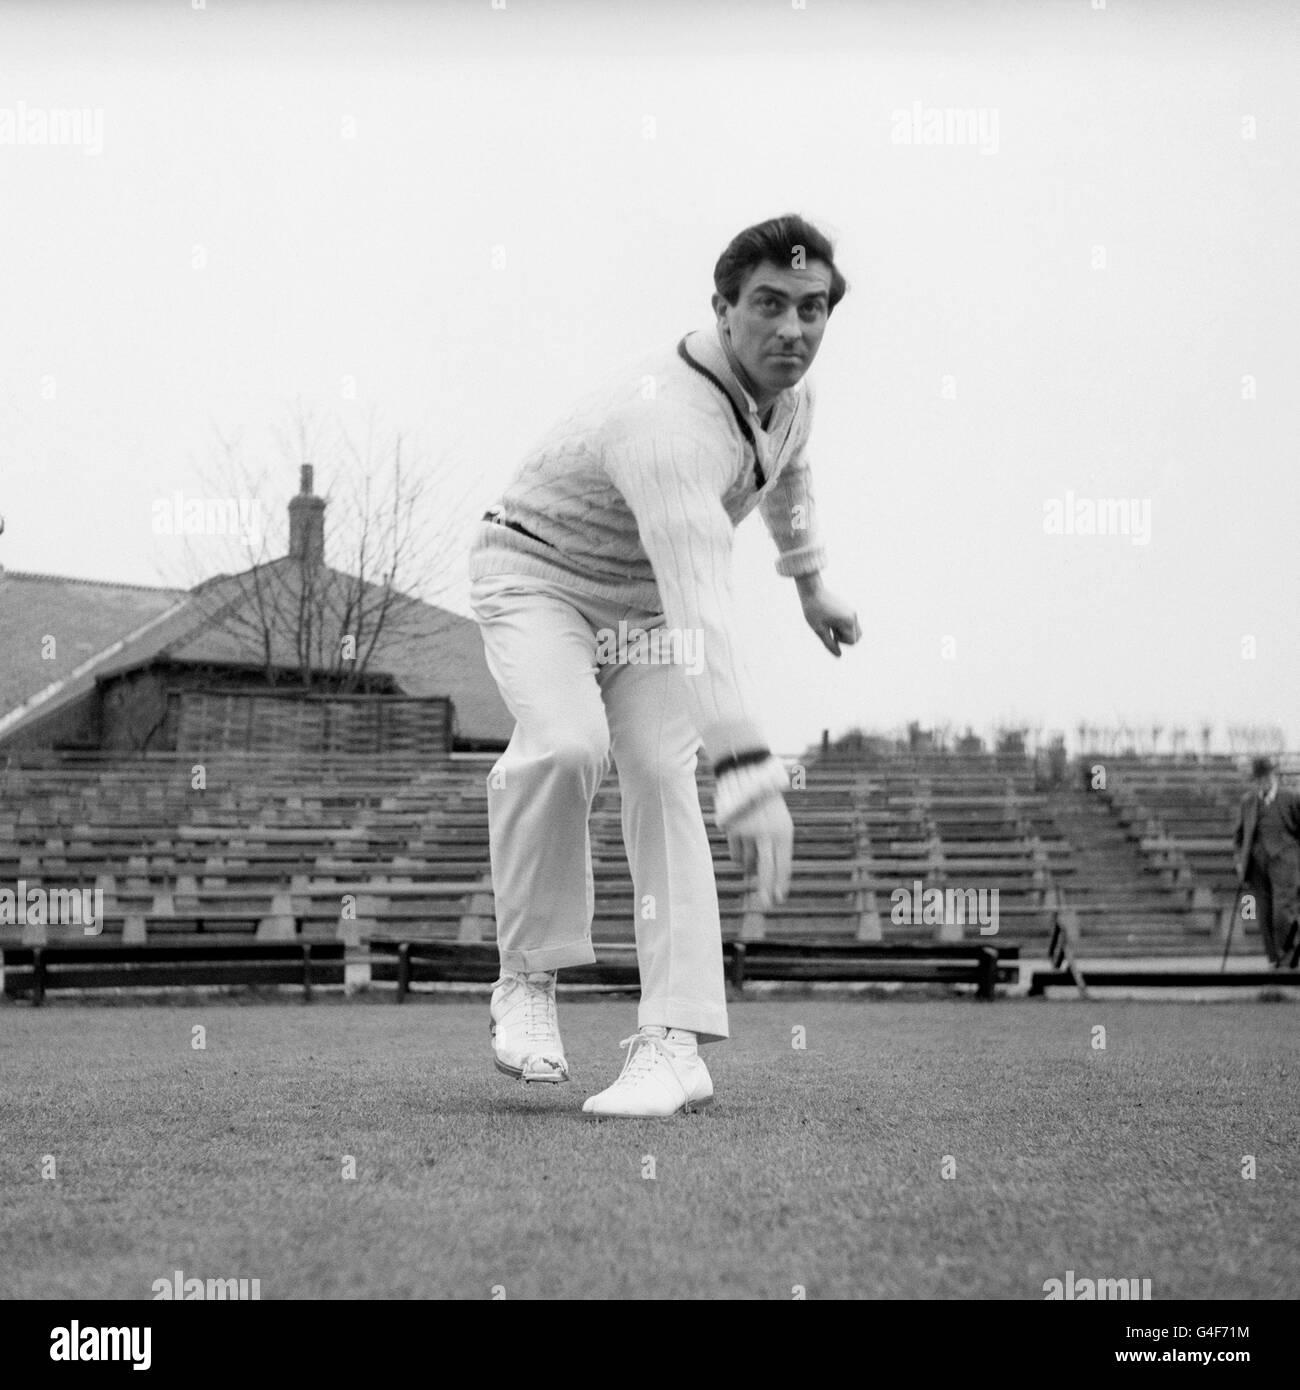 Cricket - Yorkshire CCC - Fred Trueman - Stock Image